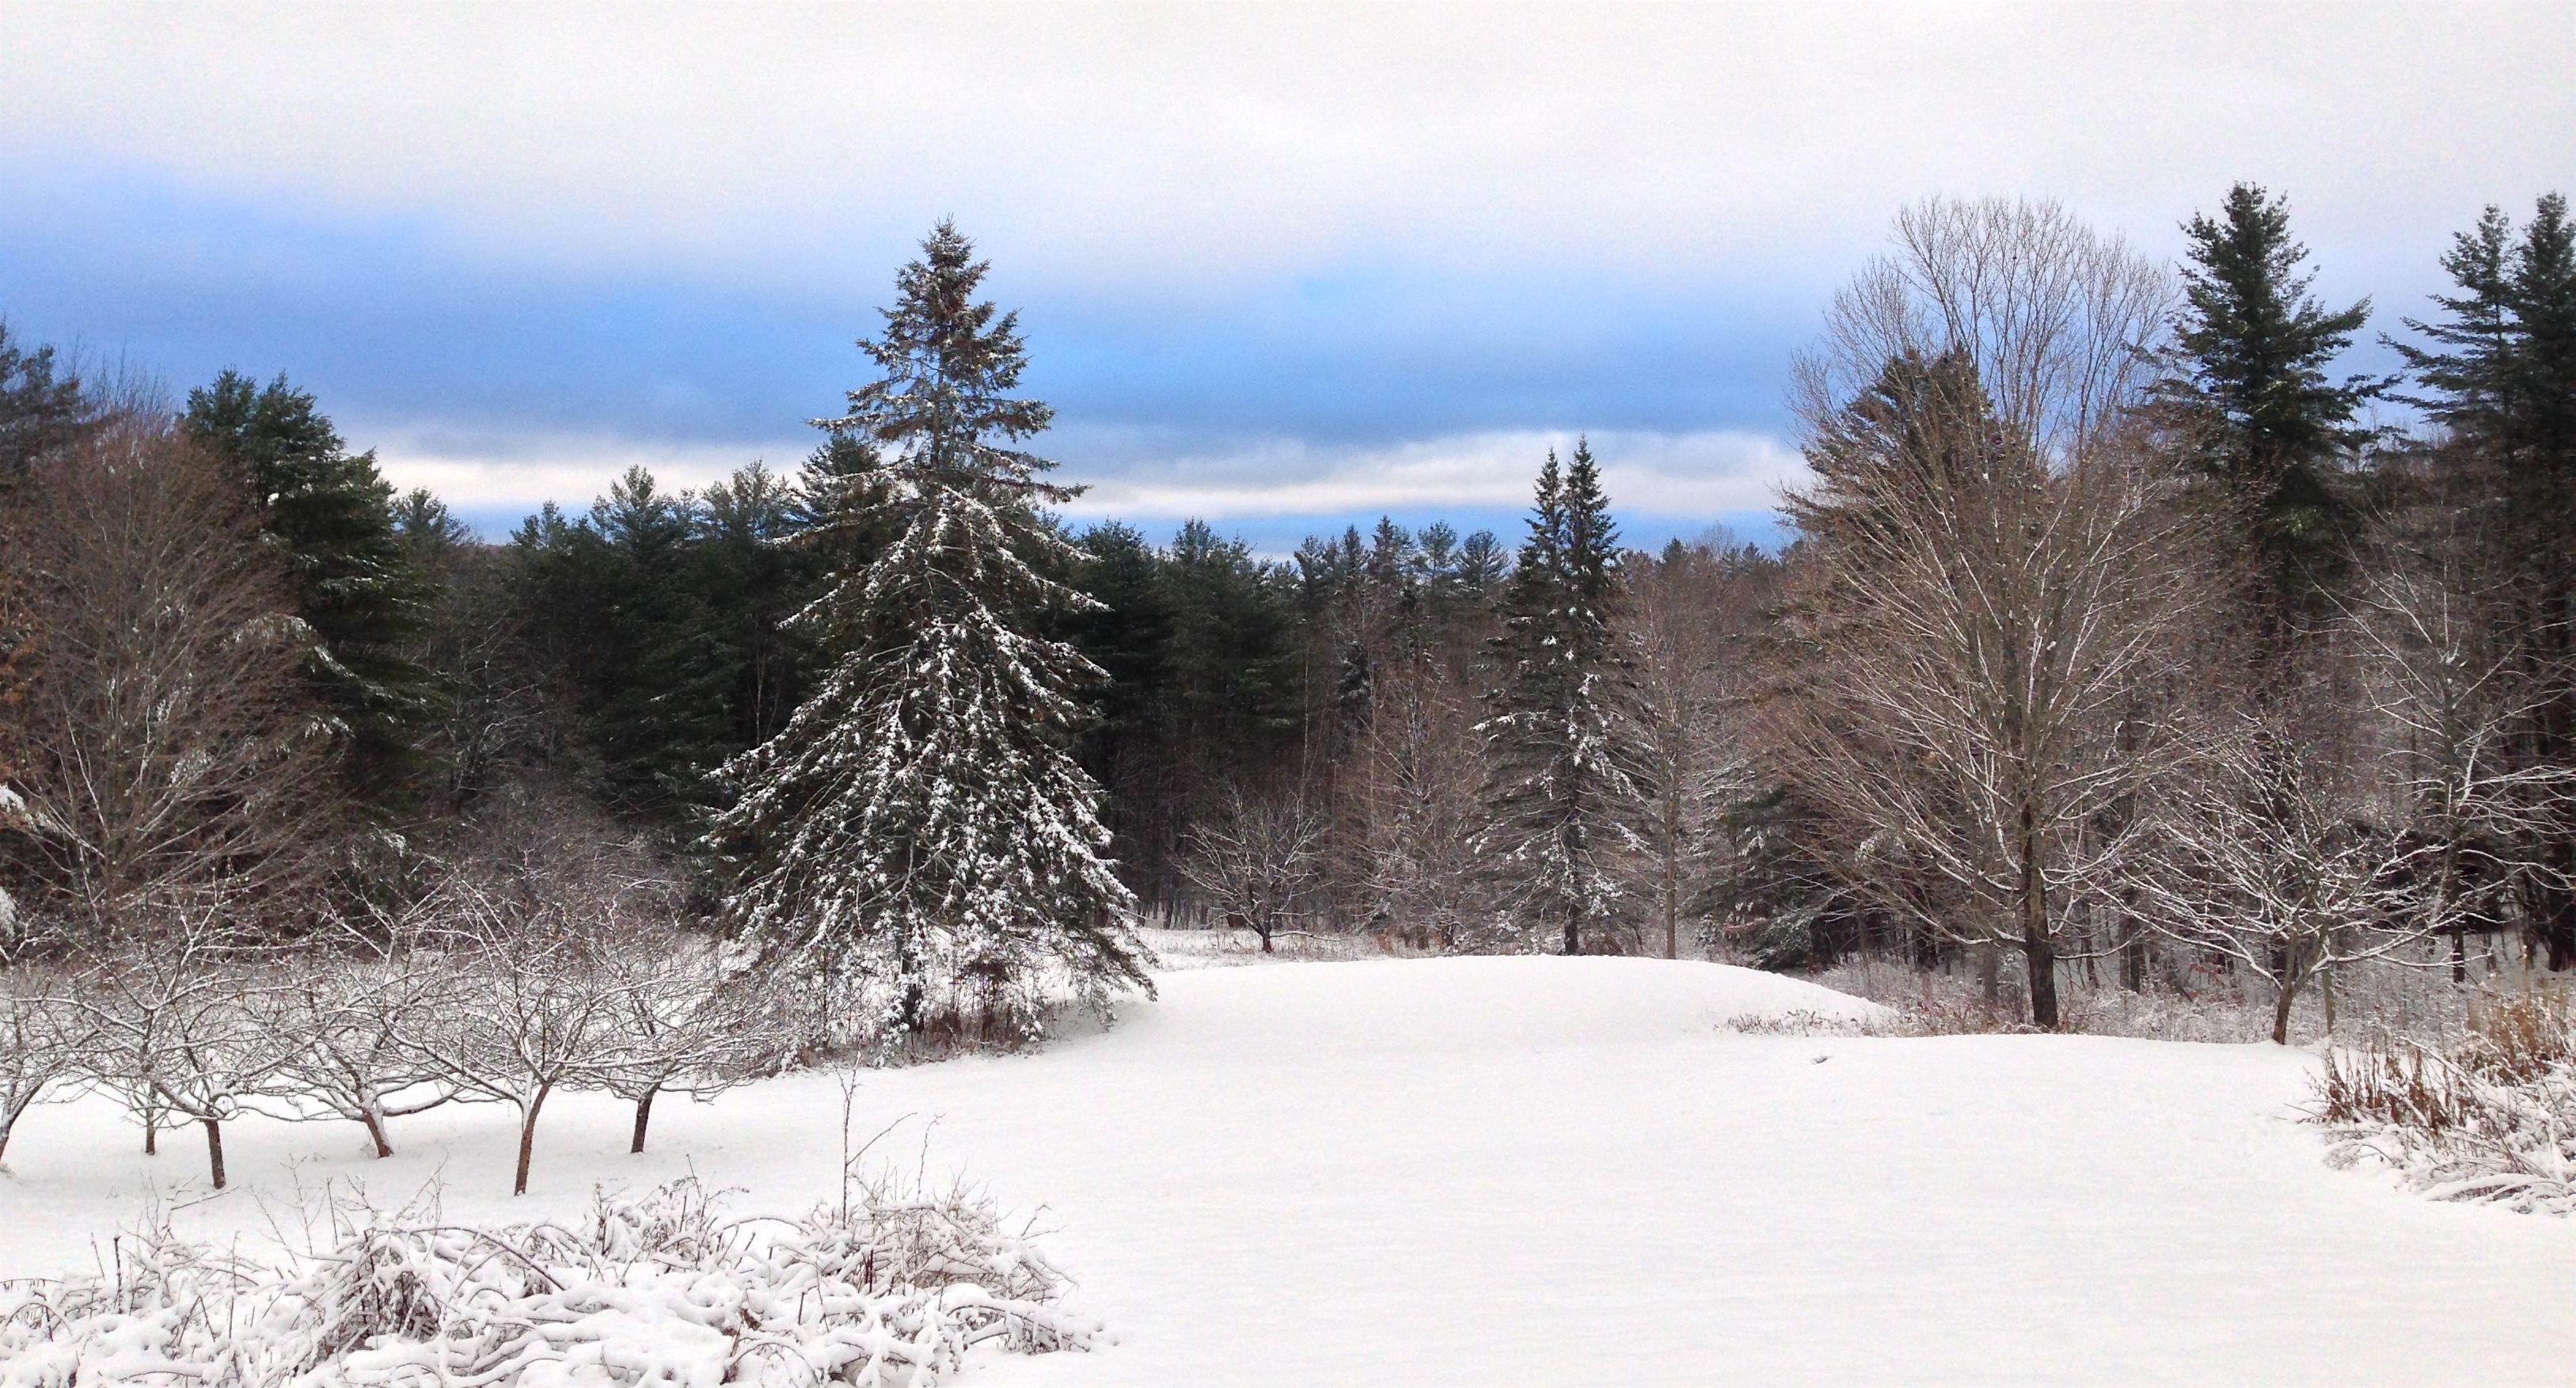 Winter on the homestead